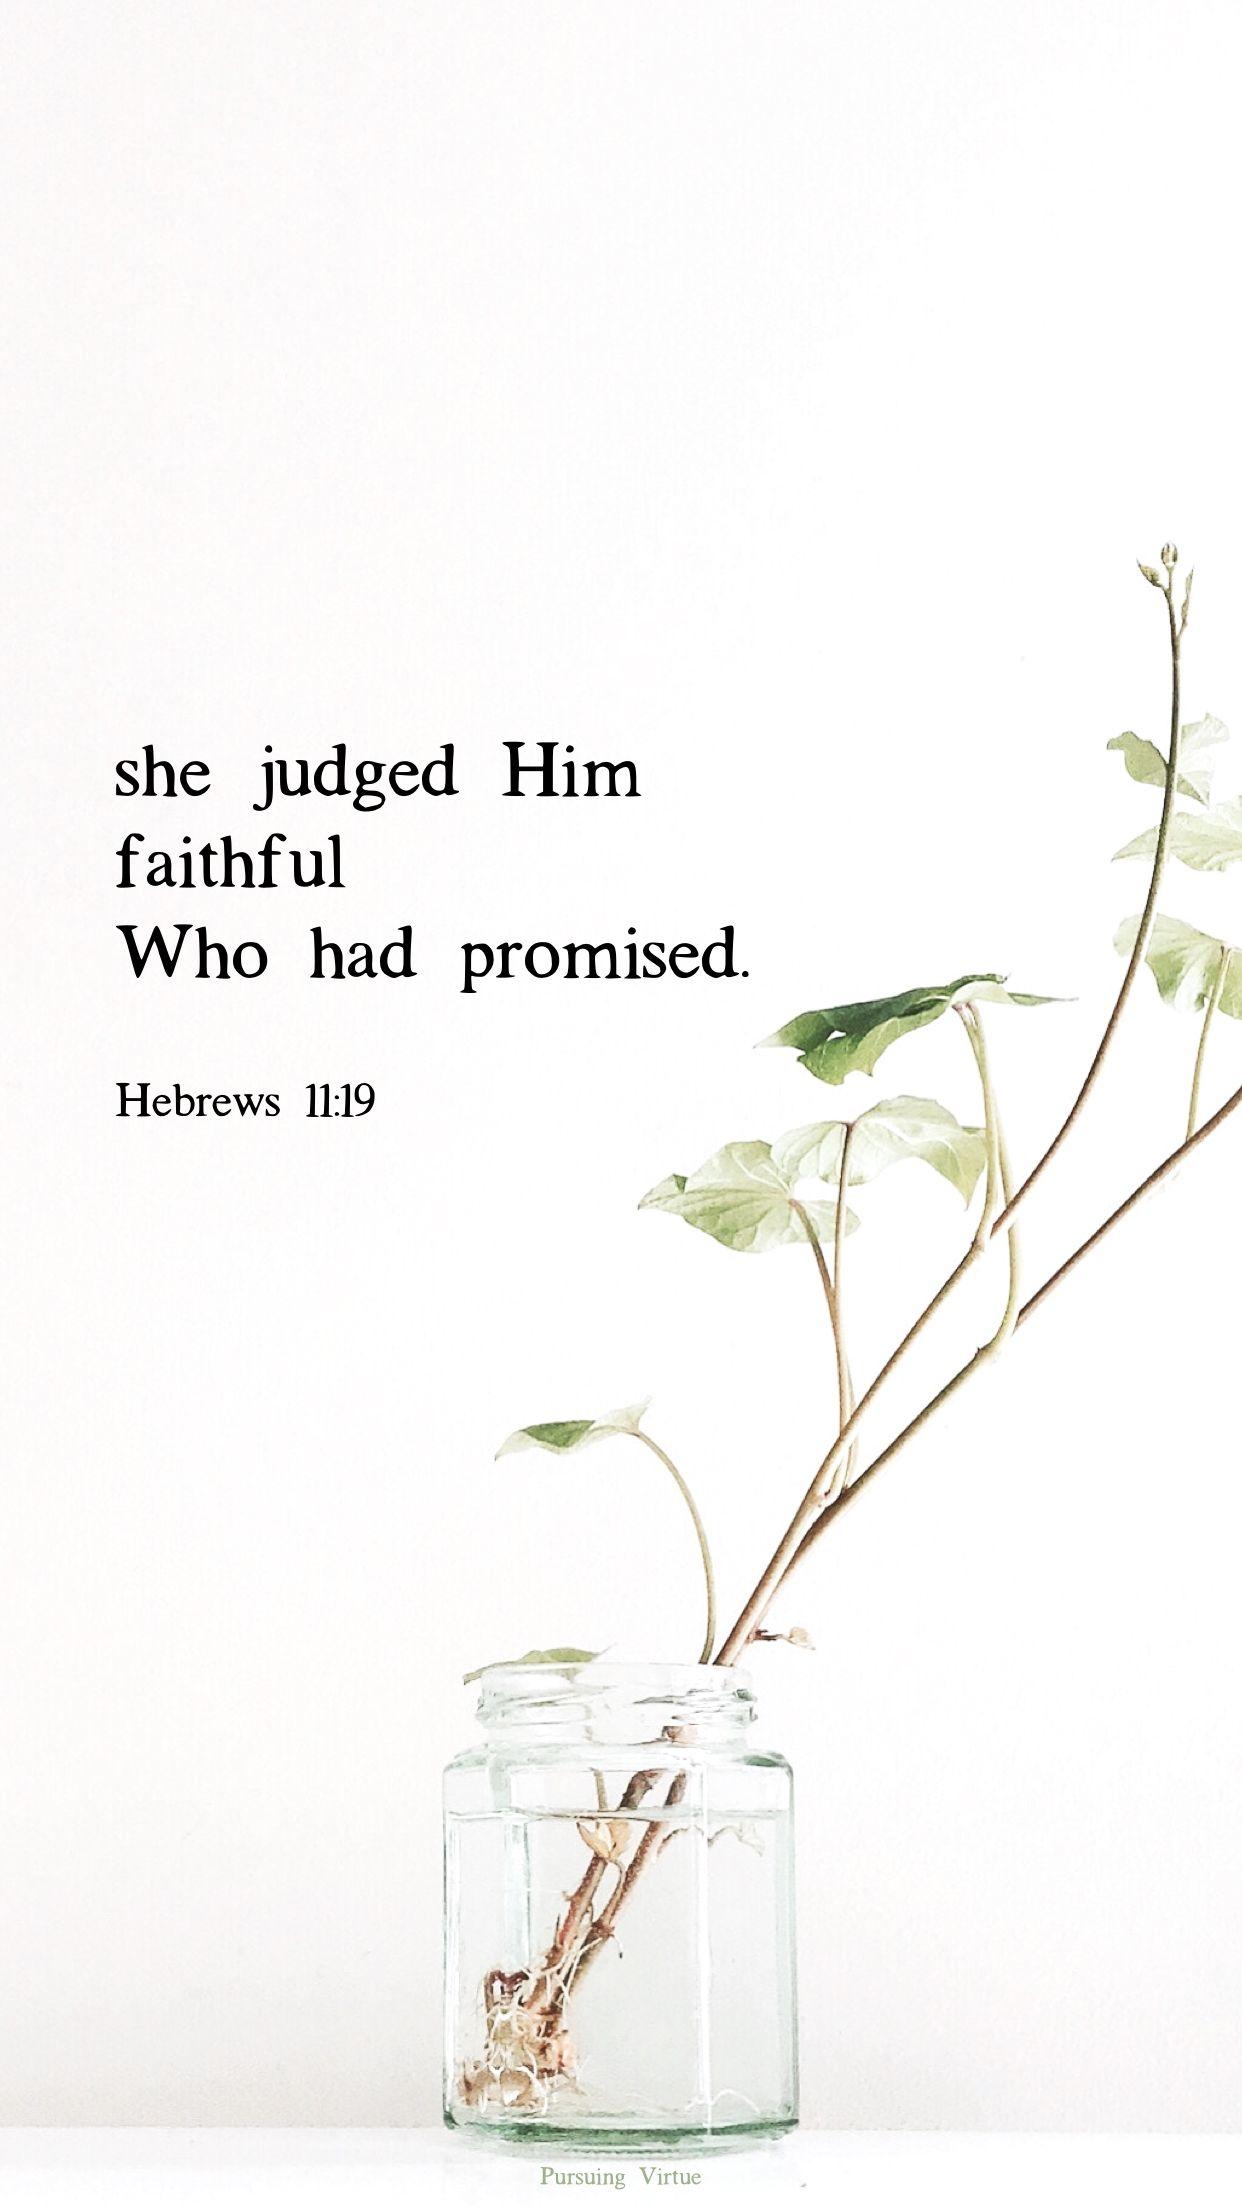 Judged Faithful